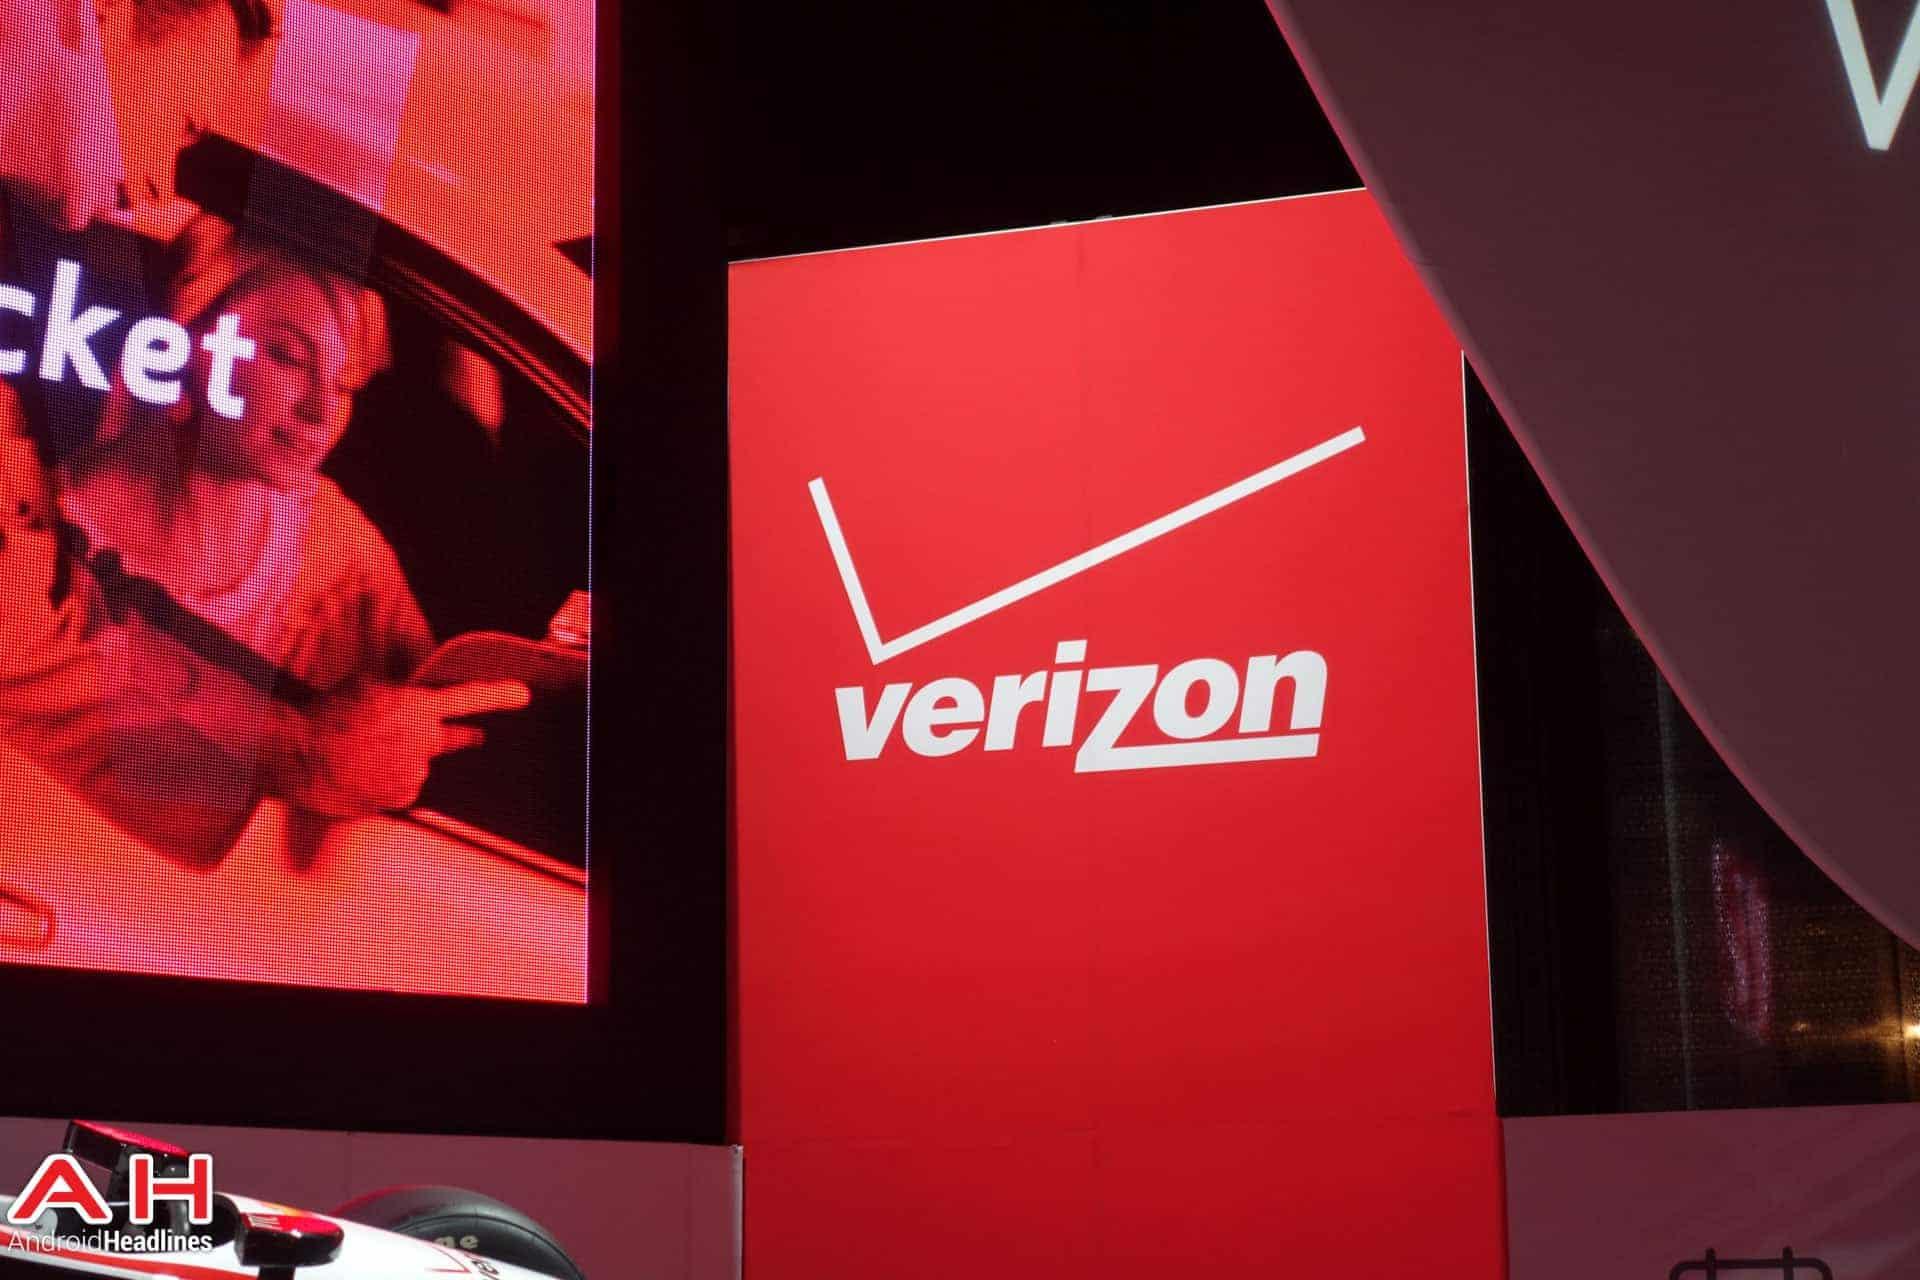 Verizon Logo AH 02492